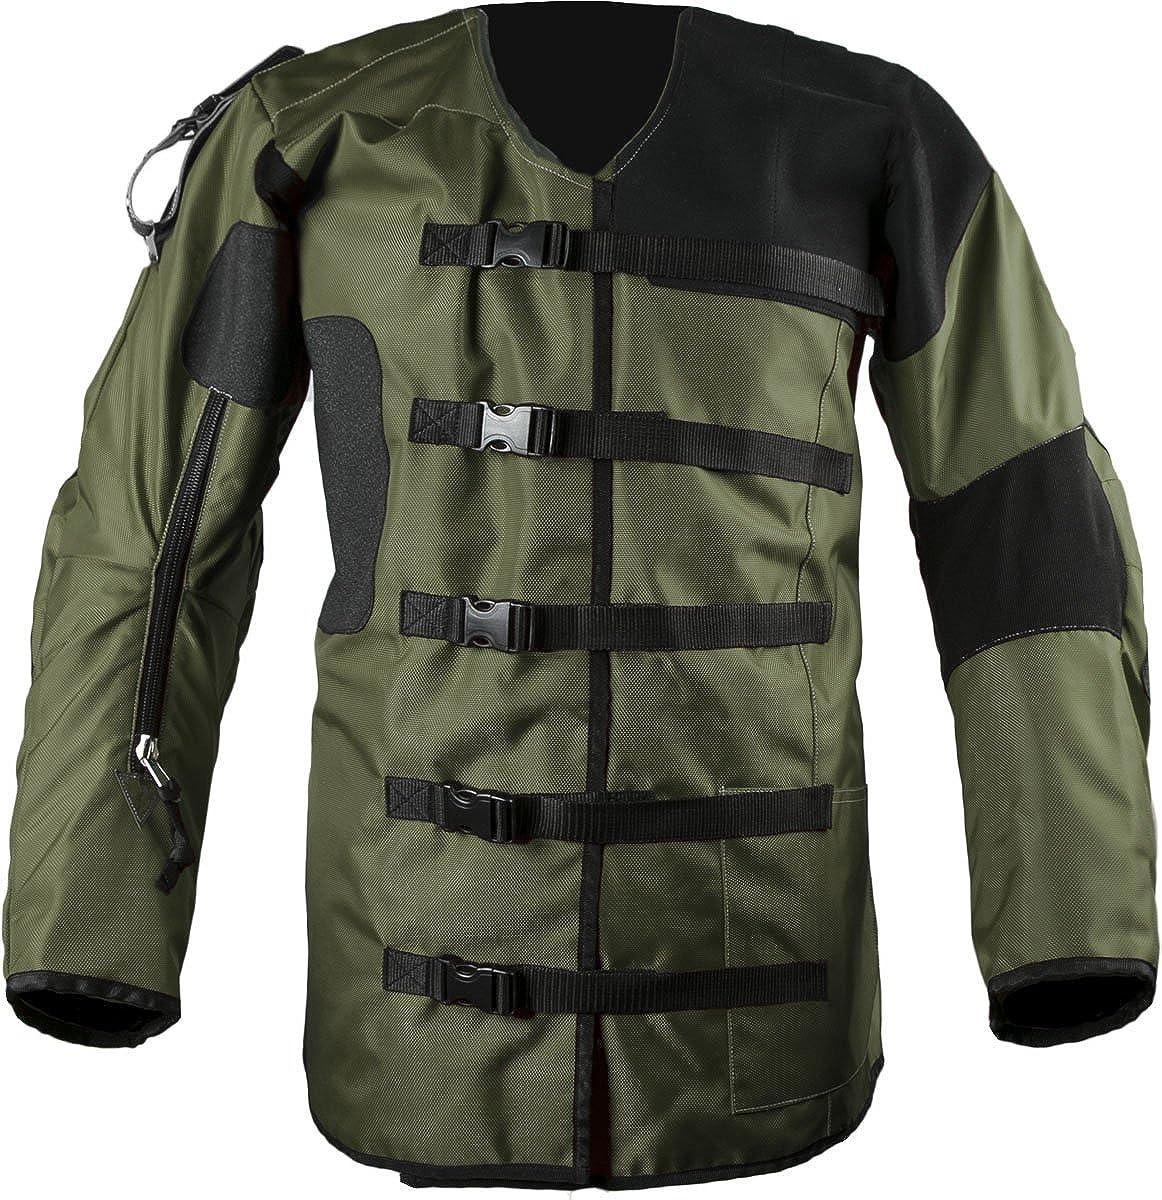 El Paso Mall TheSupplyRoom Left Handed Max 67% OFF Shooting Nylon Jacket